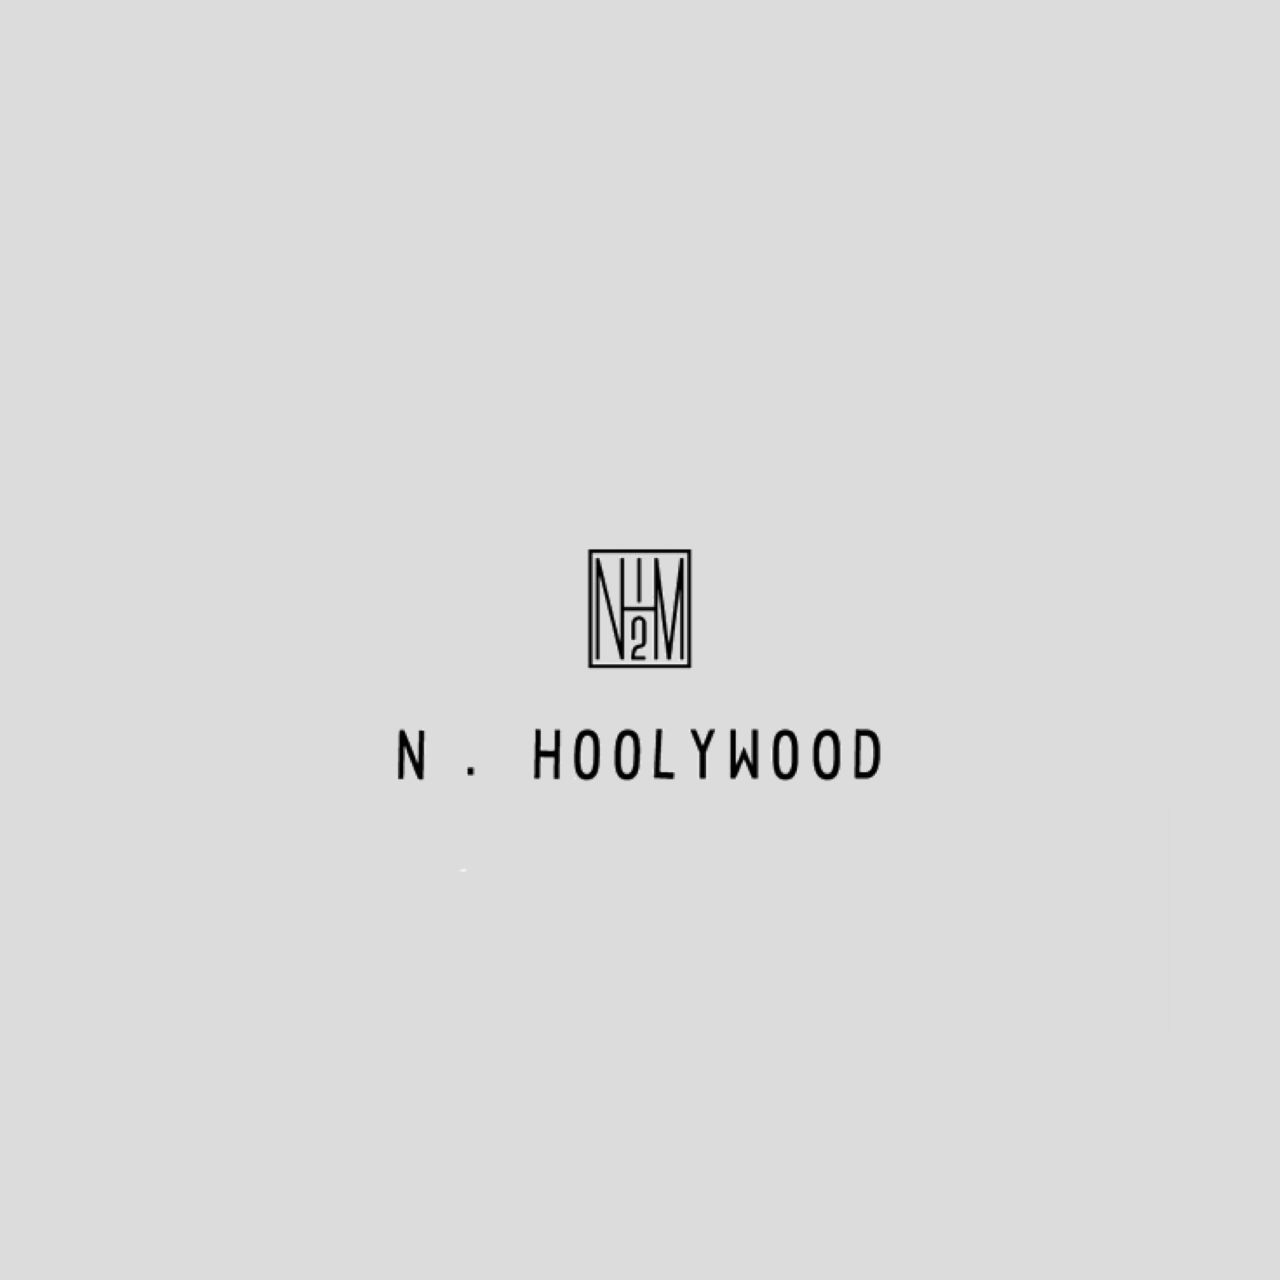 N.HOOLYWOOD 発進の写真